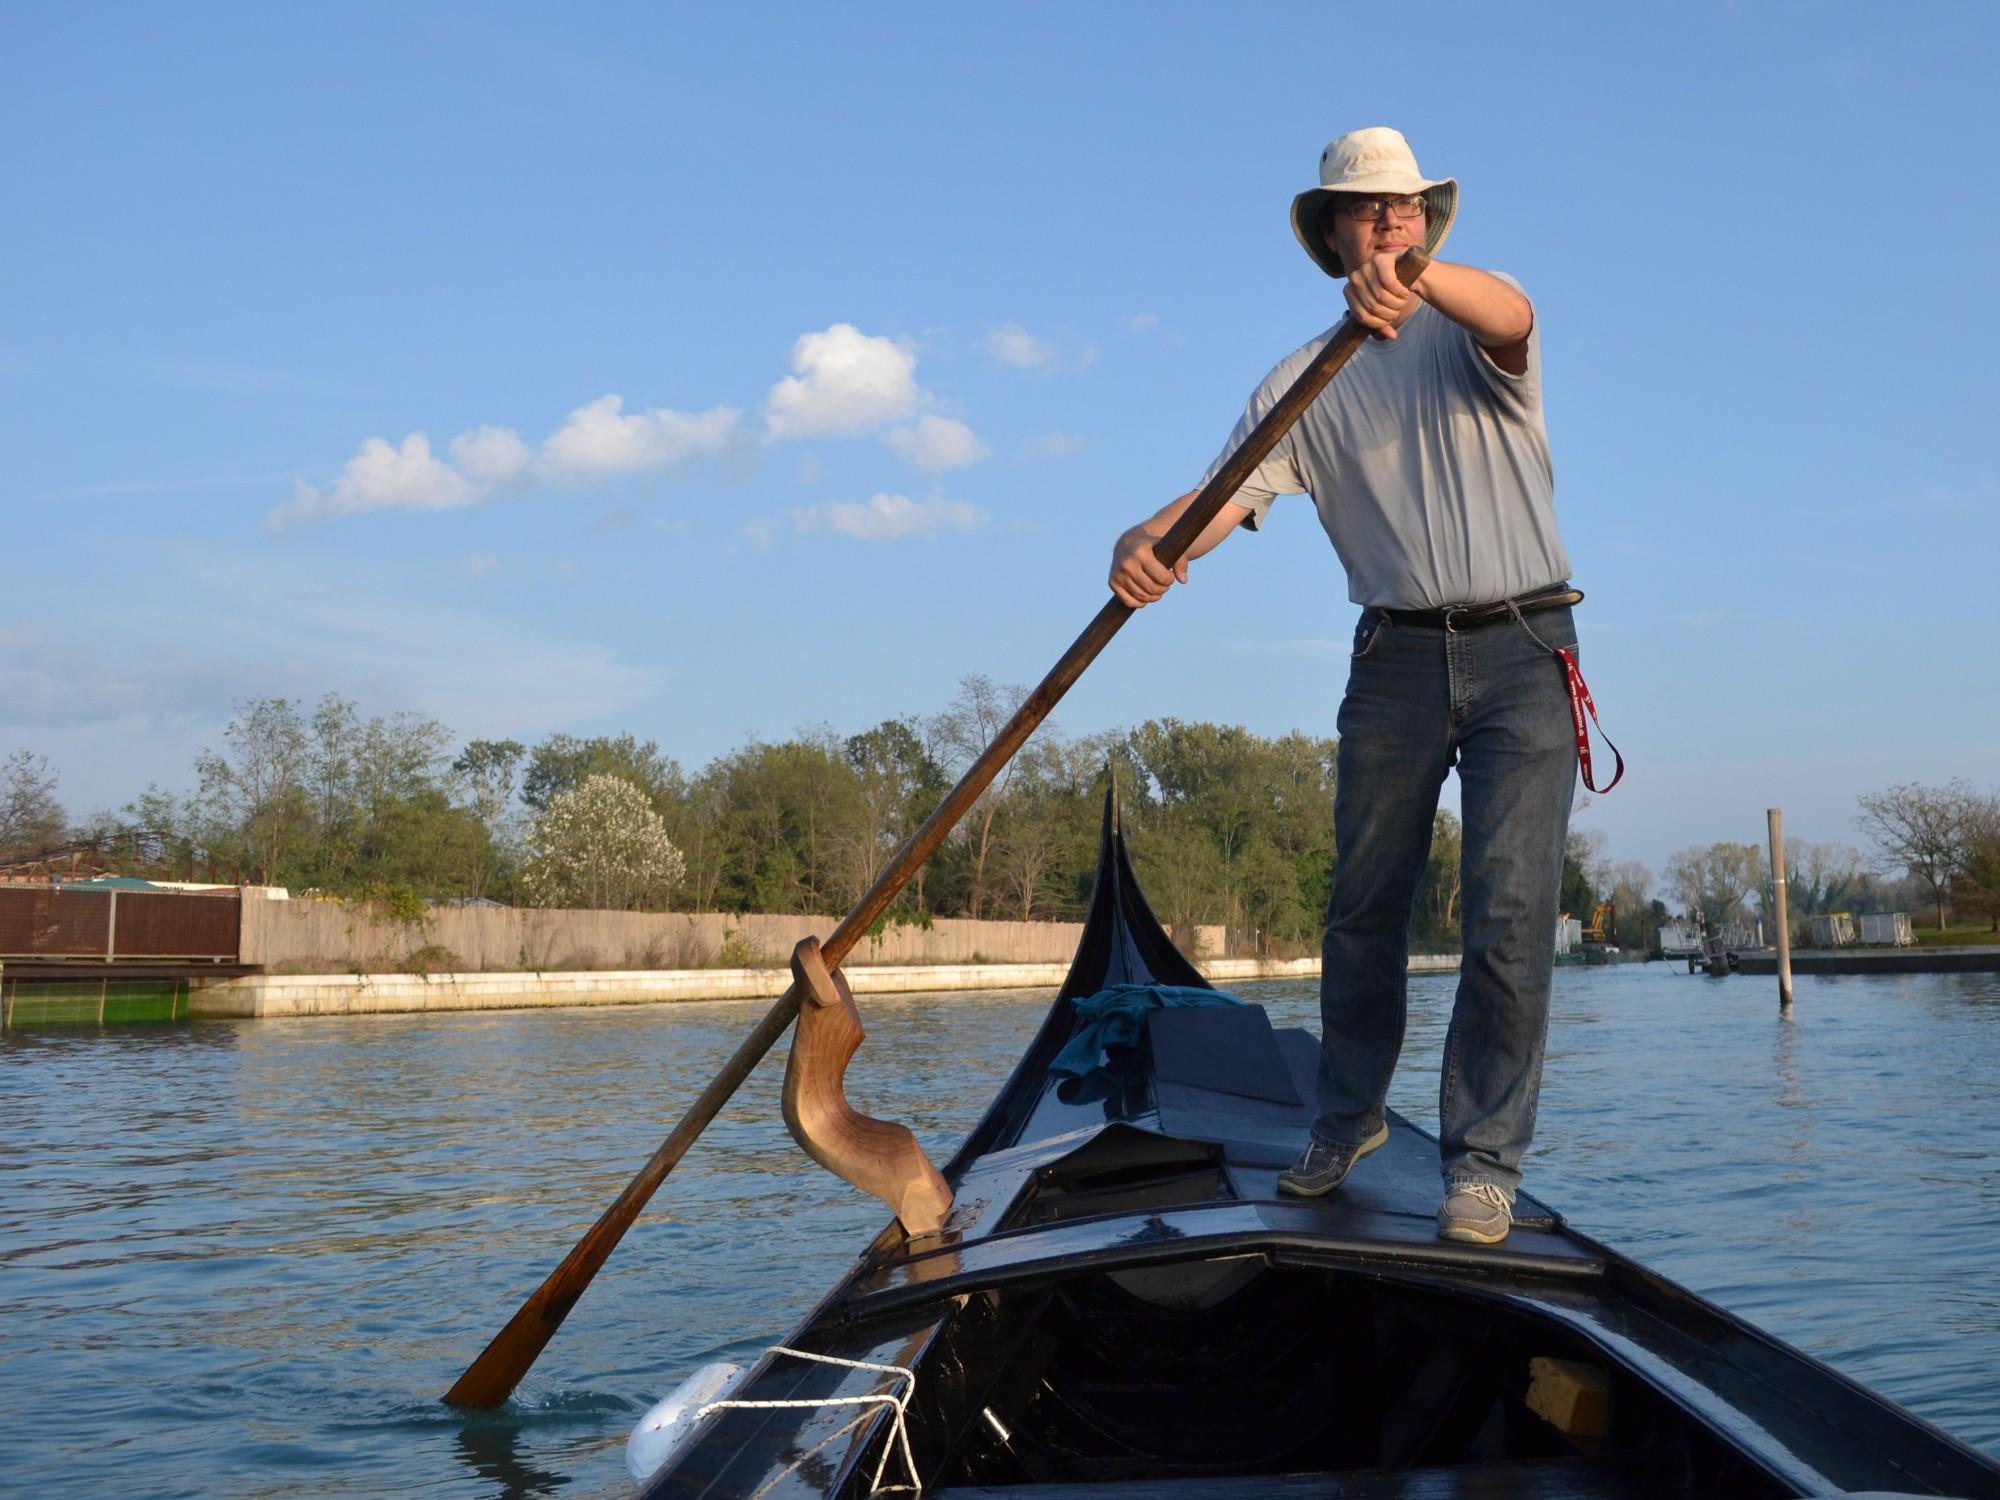 René rowing the gondola